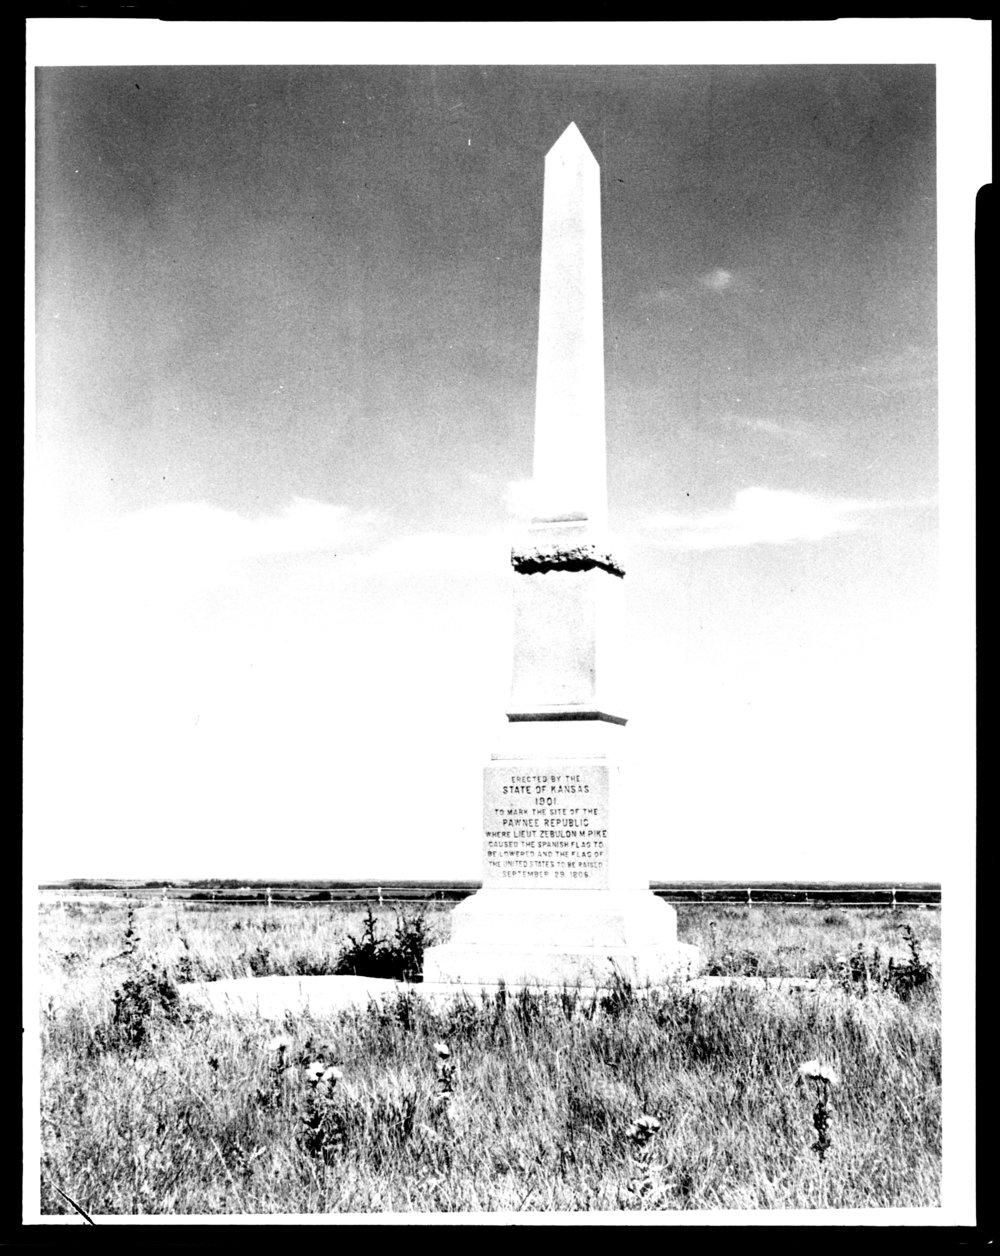 Kansas republic county agenda - Views Of The Pawnee Village Monument Republic County Kansas